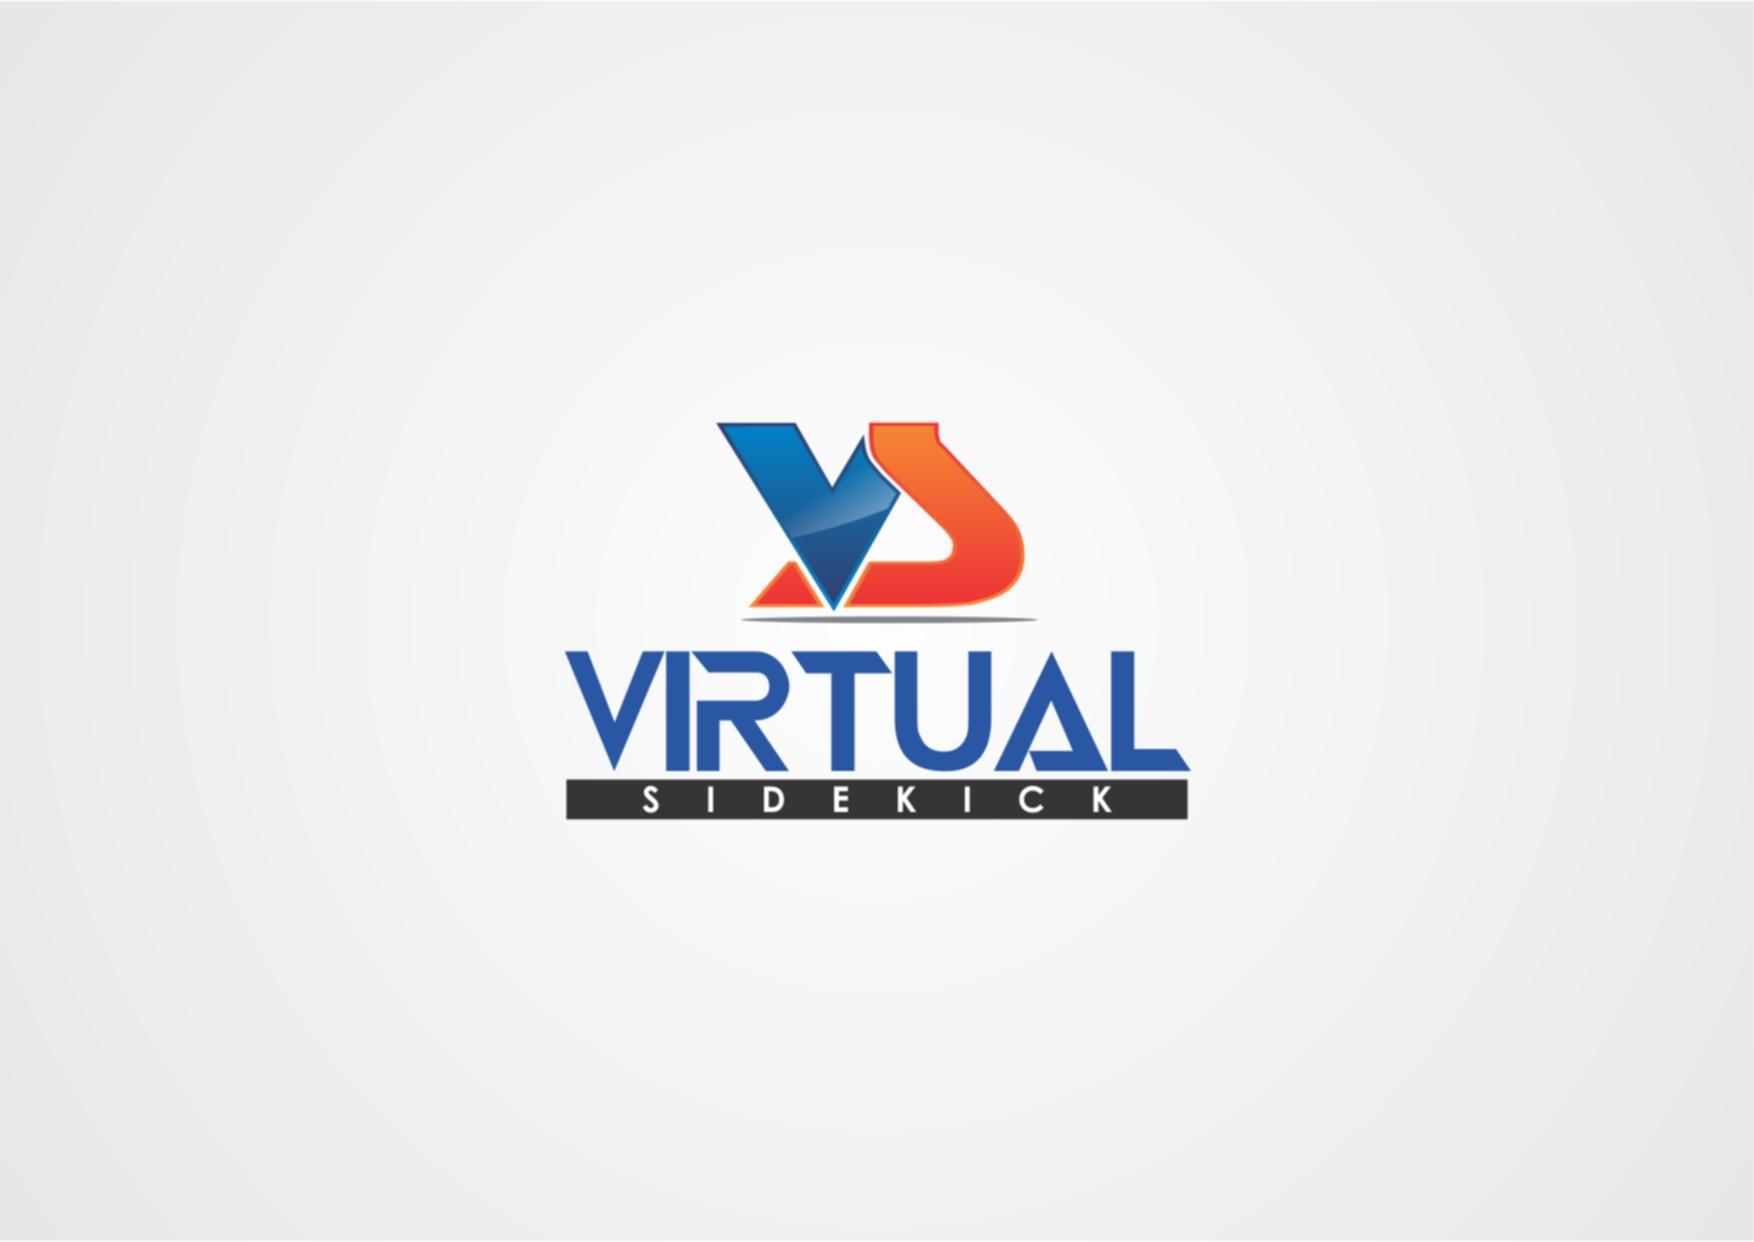 Logo Design by Private User - Entry No. 22 in the Logo Design Contest Fun Logo Design for Virtual Sidekick.